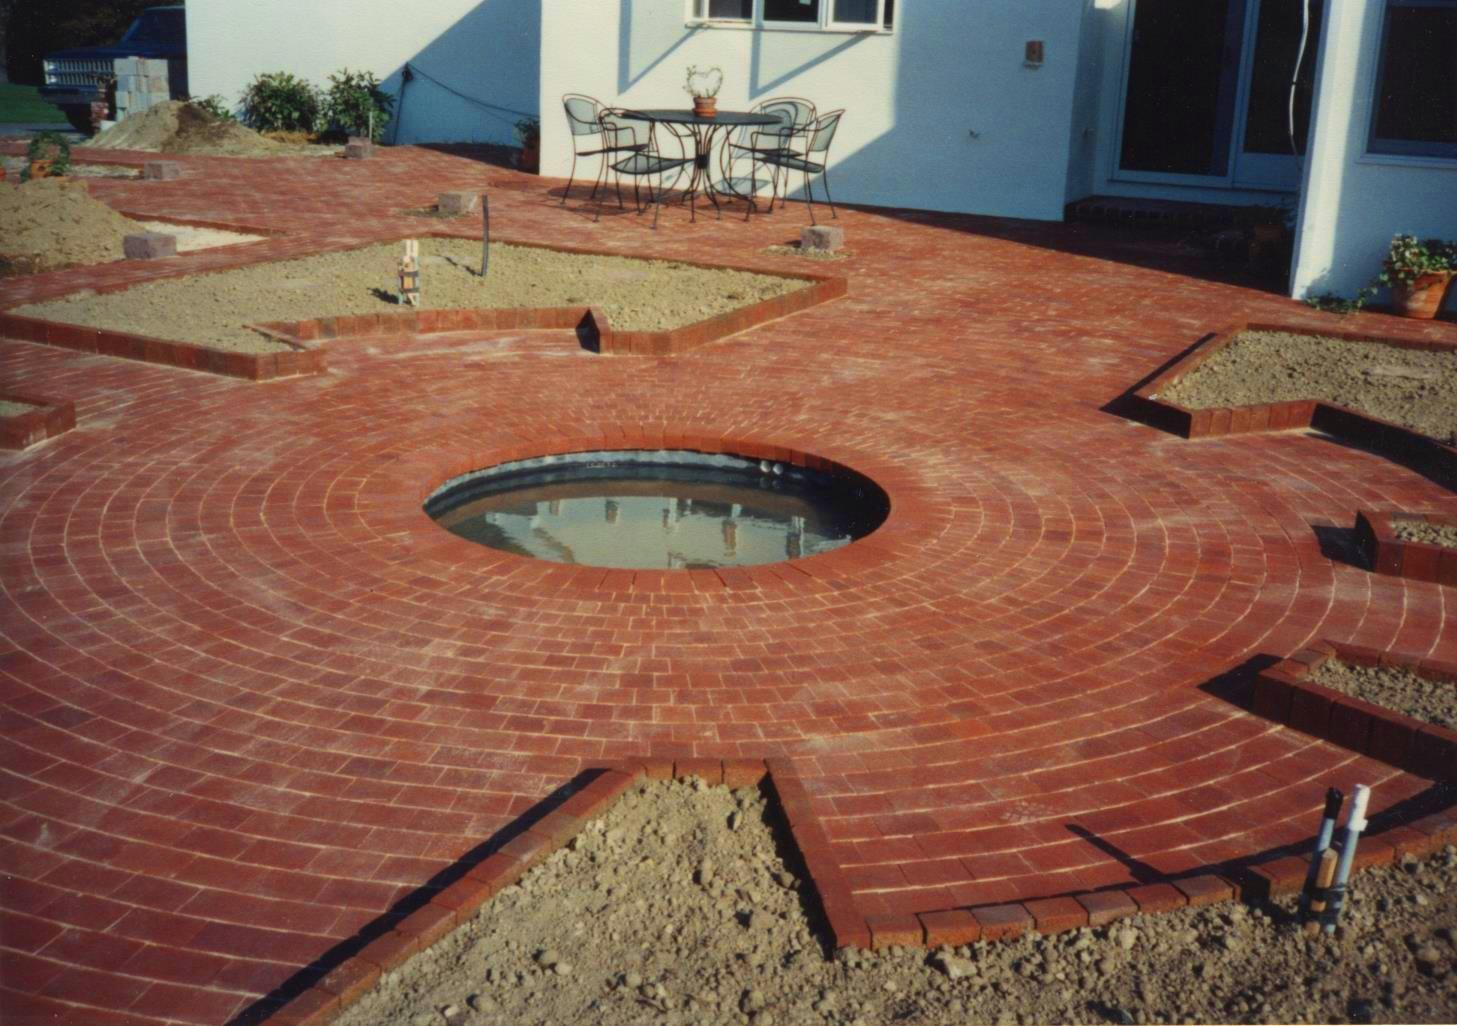 Brick Sidewalks Patios Outdoor Brick Walks Paths - Brick patios